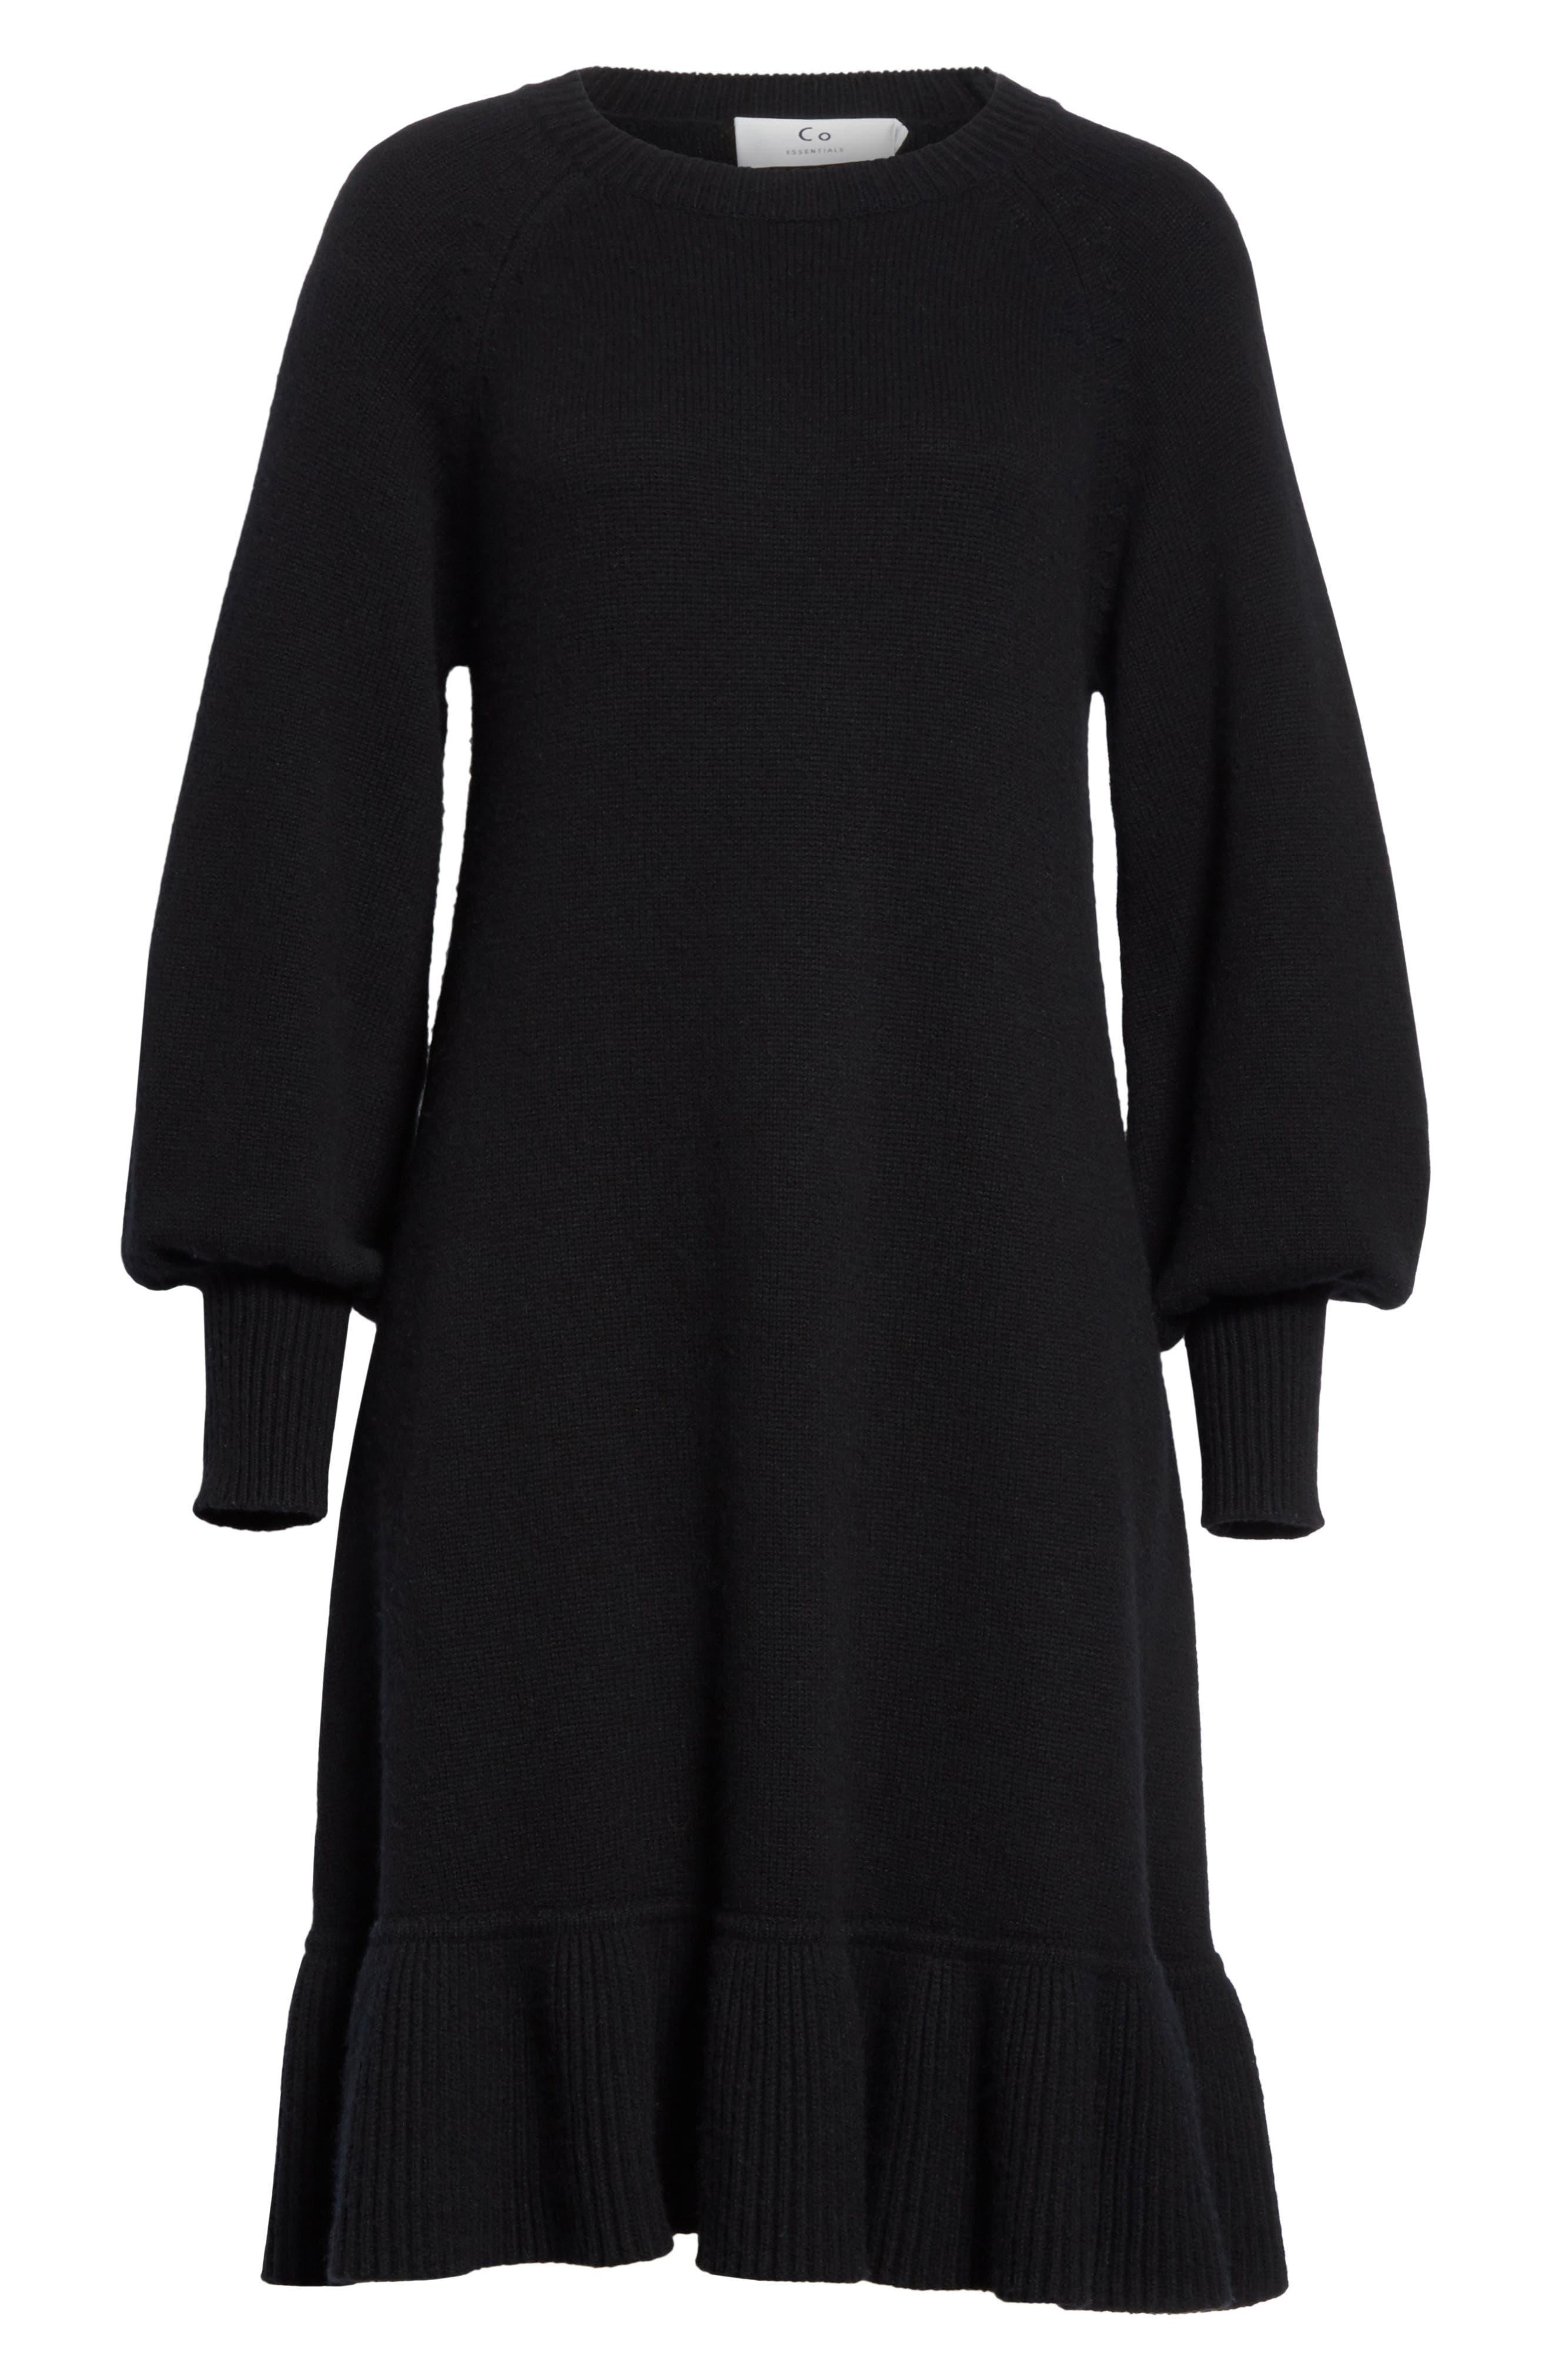 Ruffle Wool & Cashmere Sweater Dress,                             Alternate thumbnail 6, color,                             Black